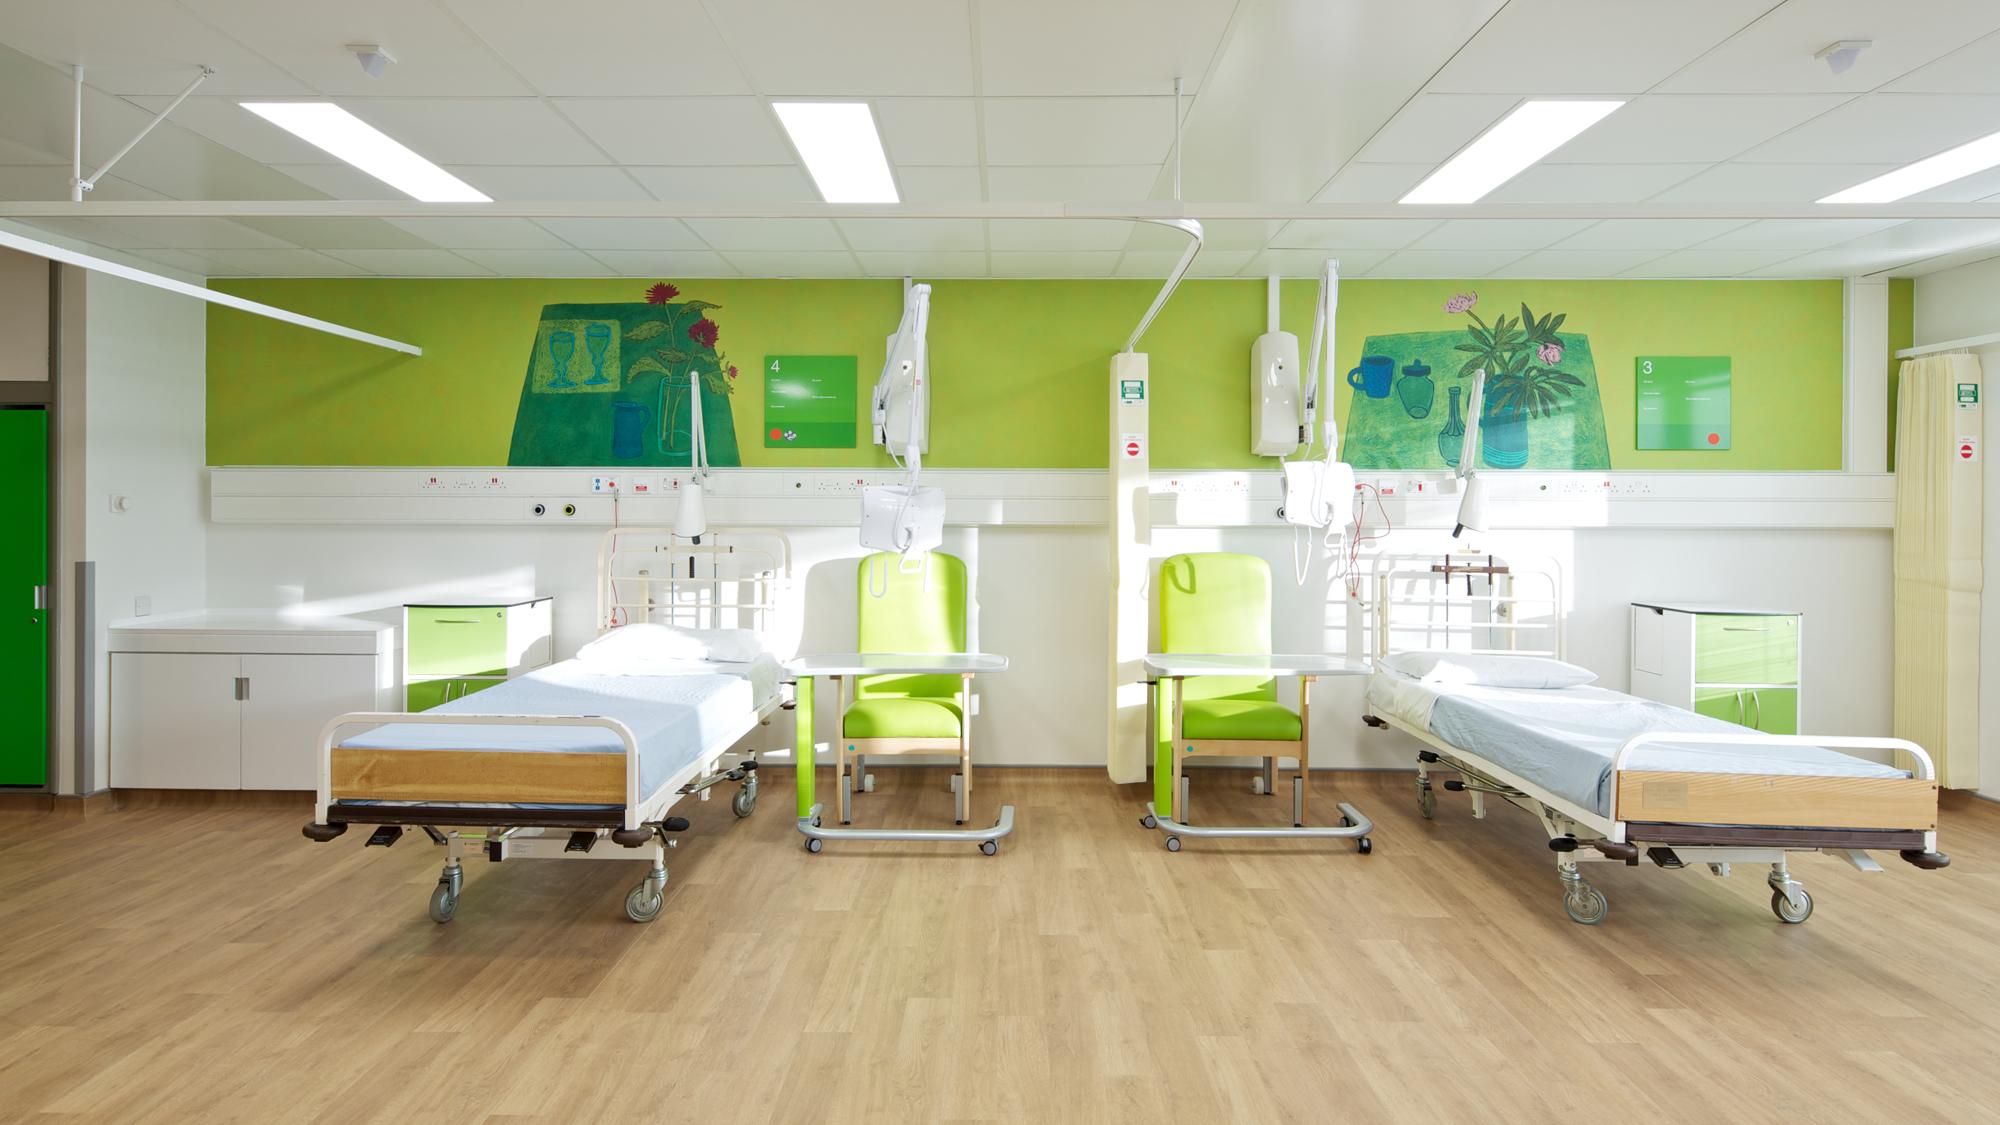 Hillingdon hospital gbshealth architecture for health for Interior design simulator